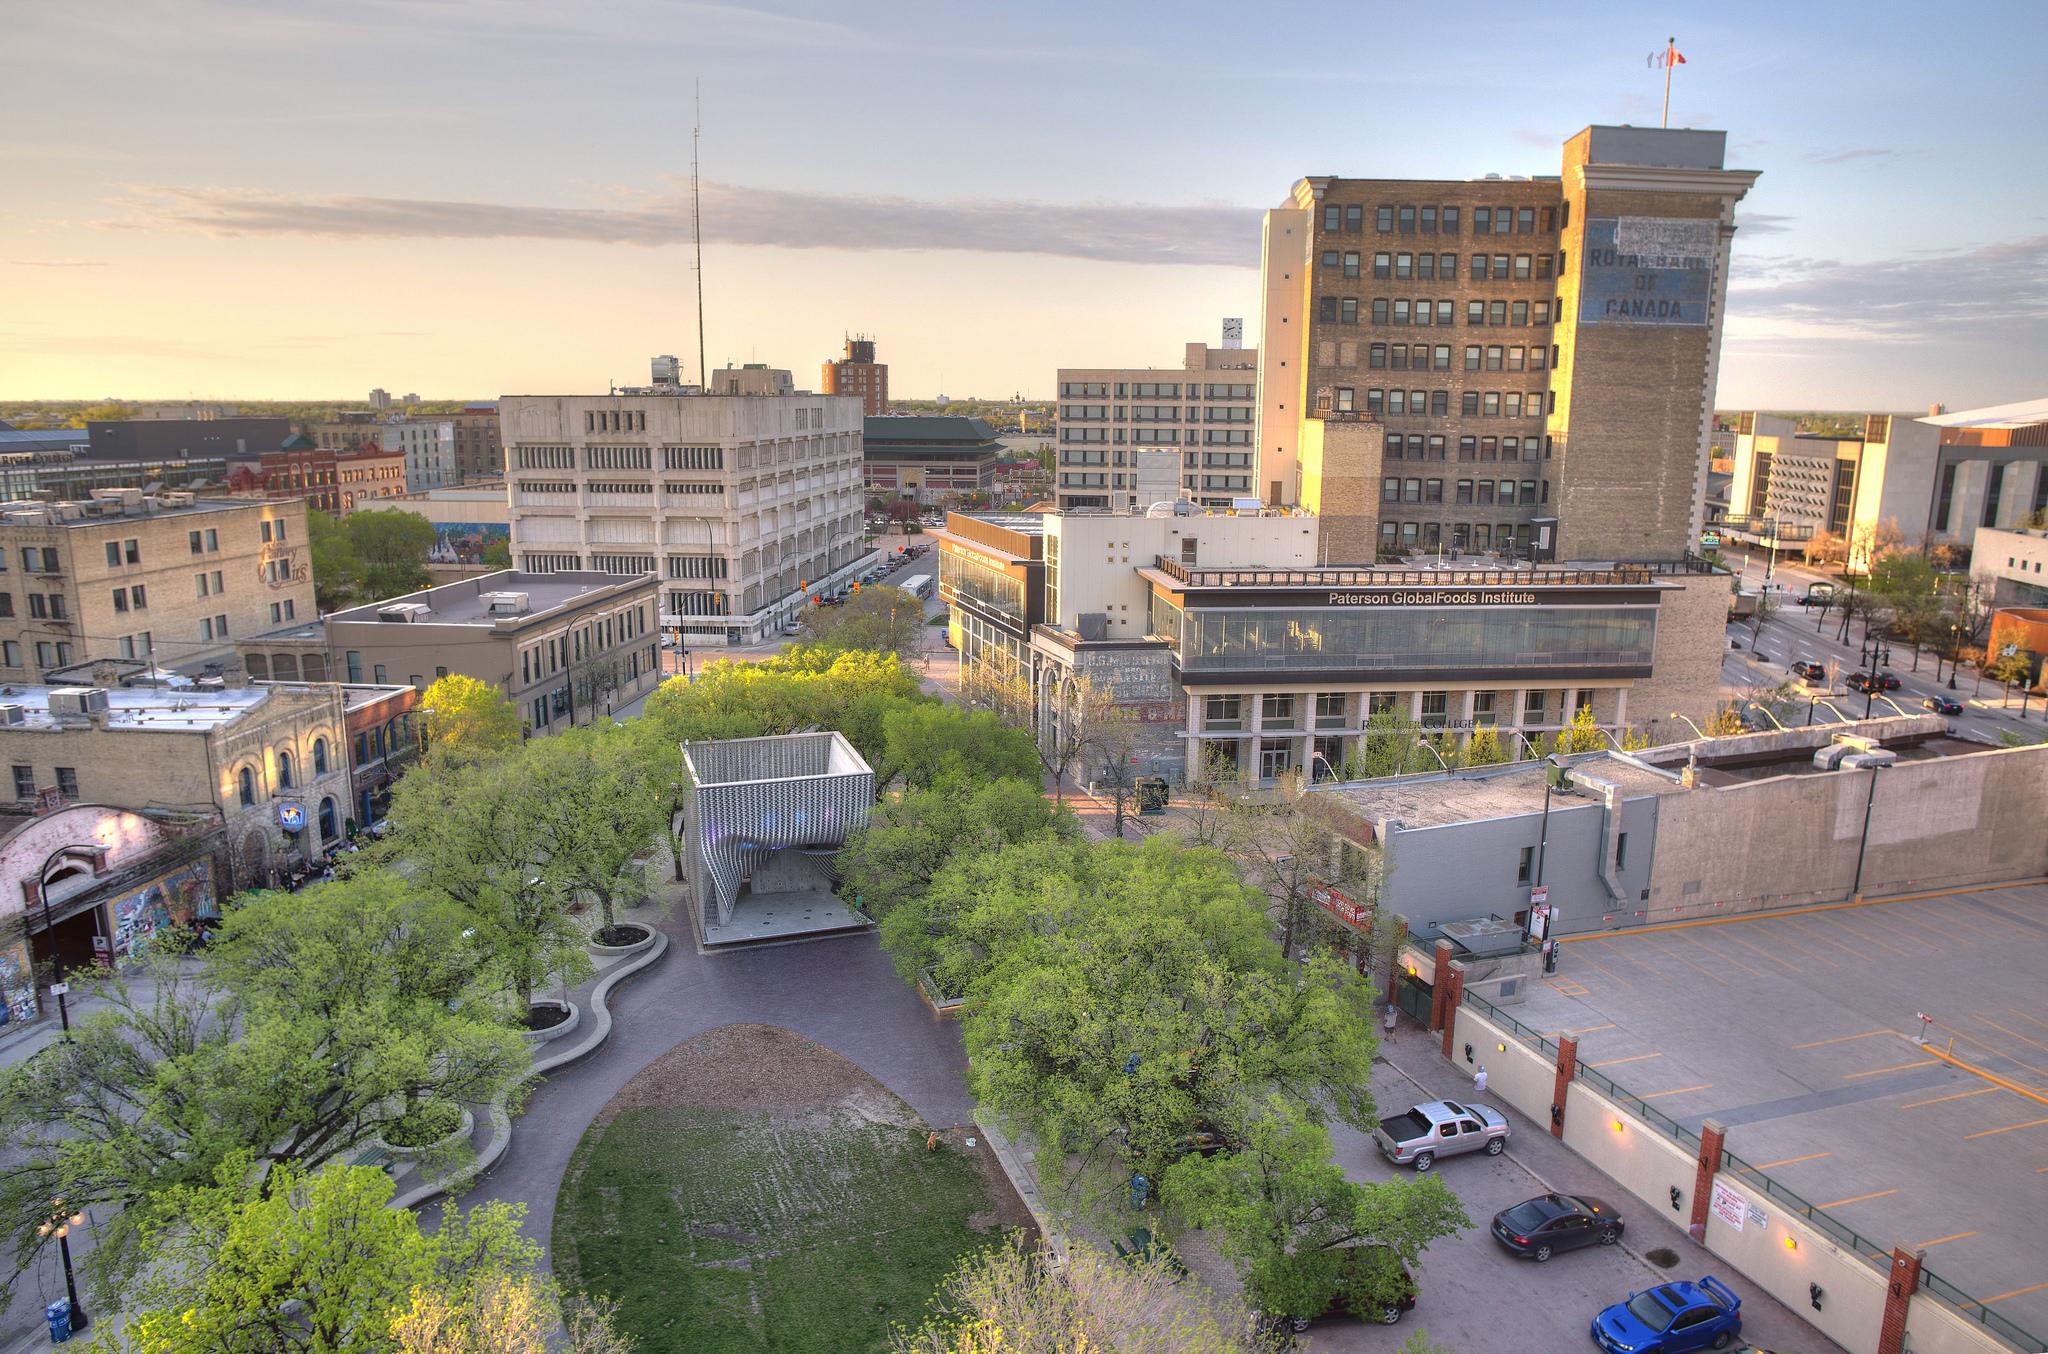 Winnipeg Canada Attractions